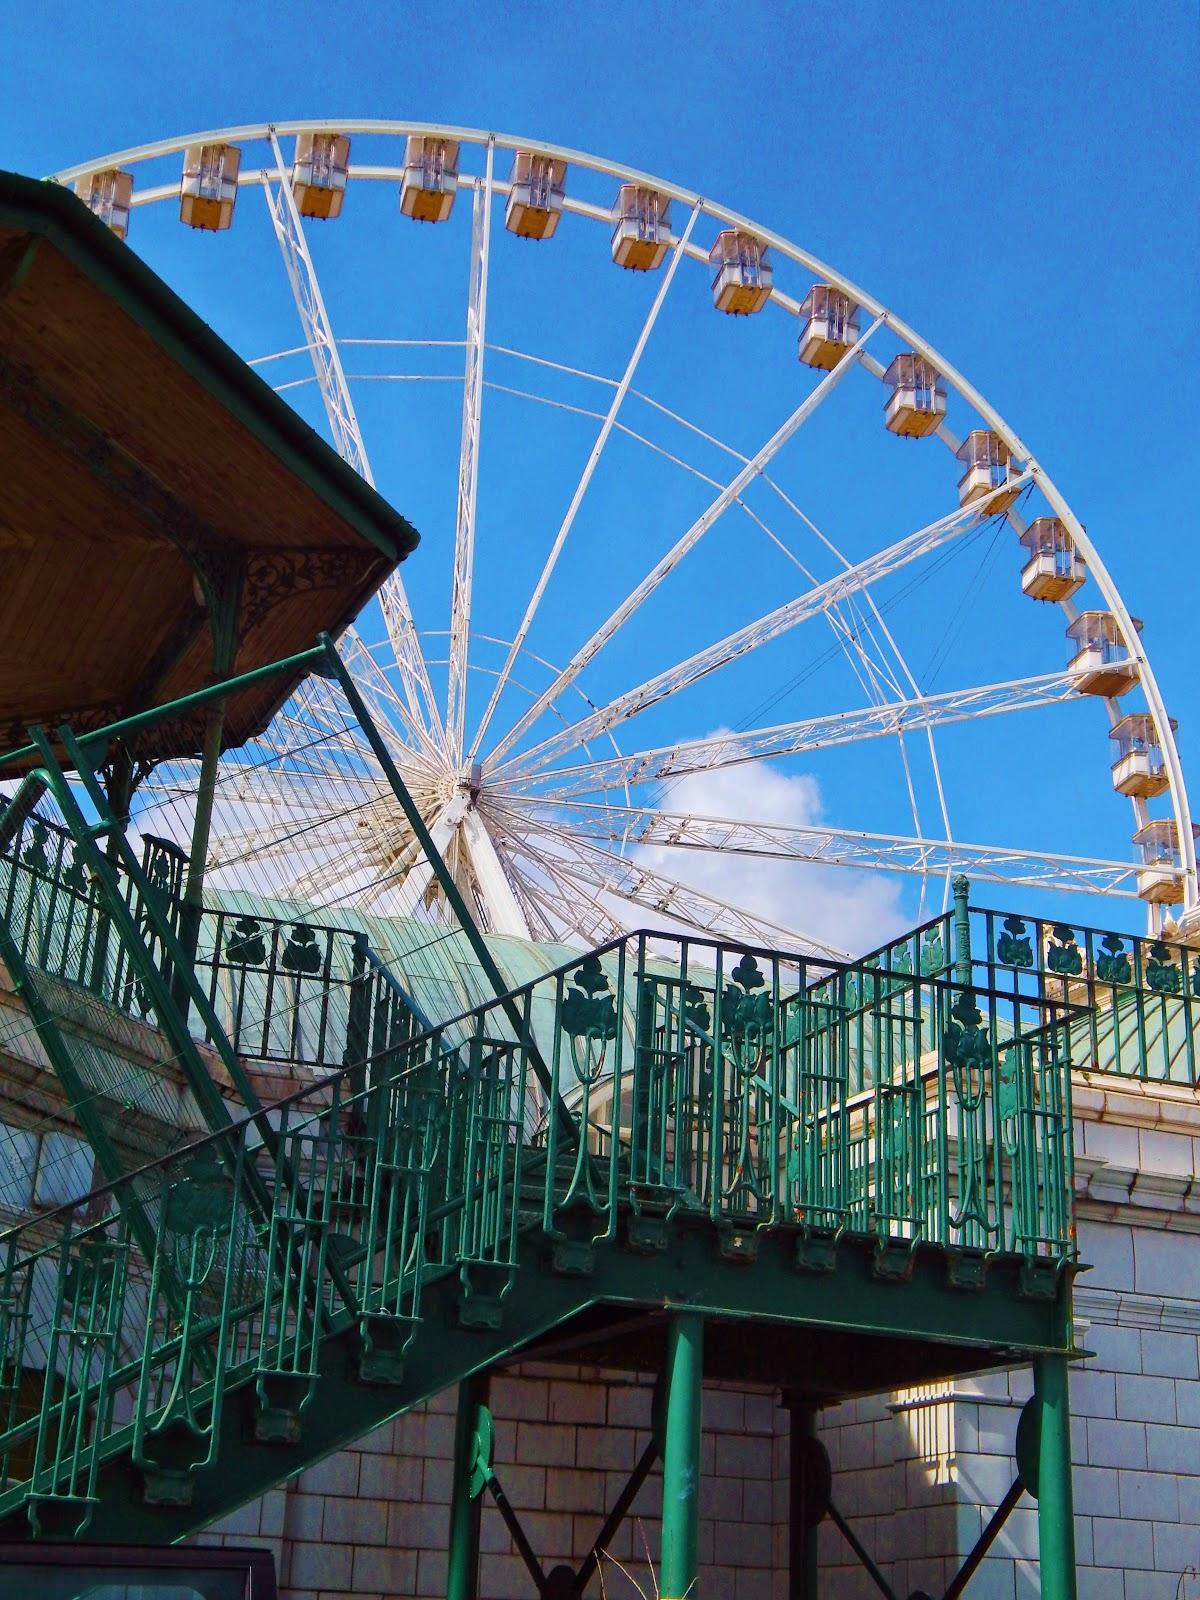 Torquay Ferris Wheel